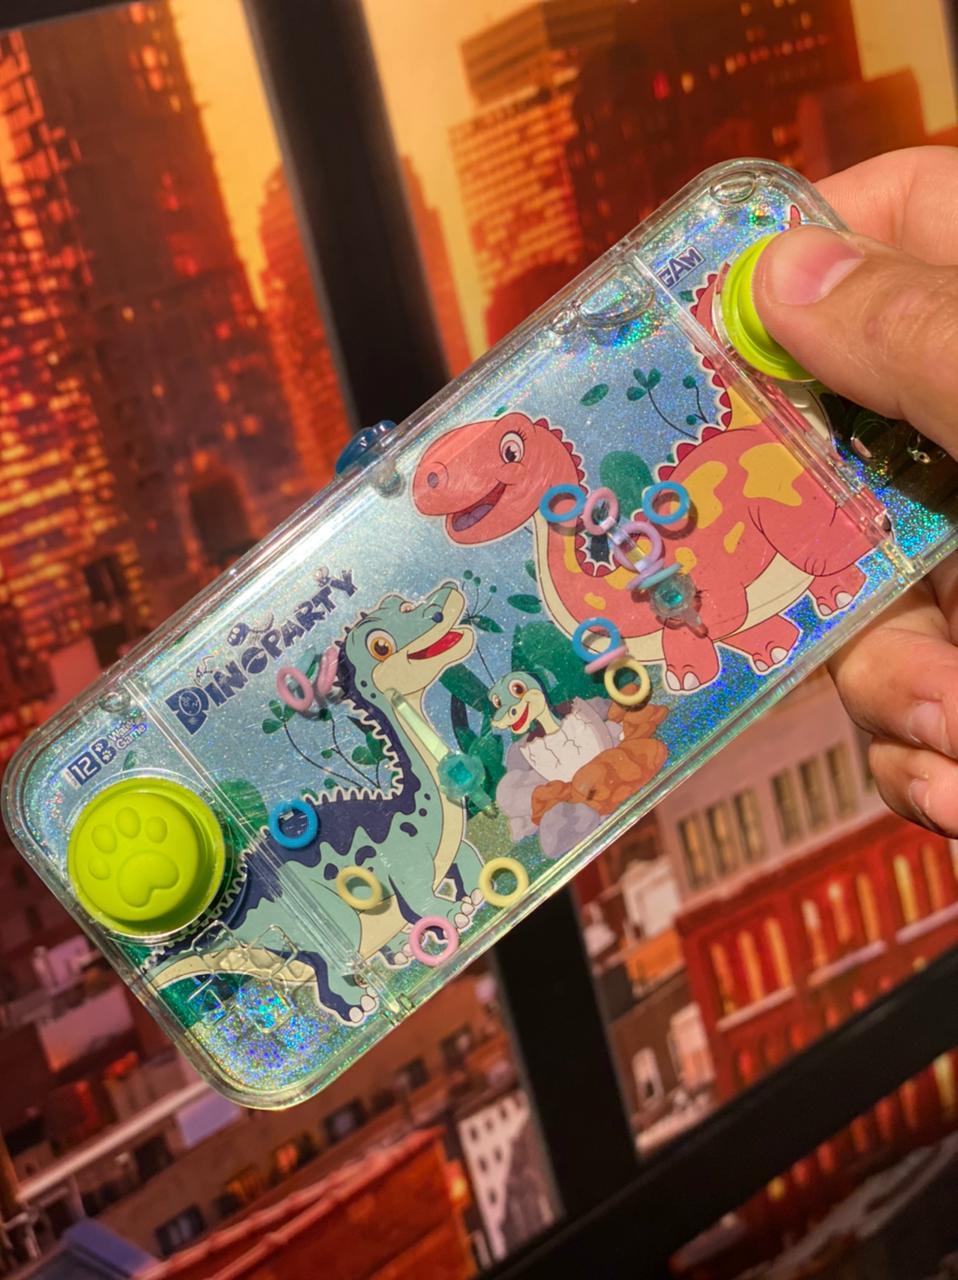 Jogo de Argolas Mini Game de Água Aquaplay Dinossauro Anti Estresse Pop It Fidget Bubble Stress Ball Wacky Track SquishMallow Sensorial de Alívio de Stress - EV